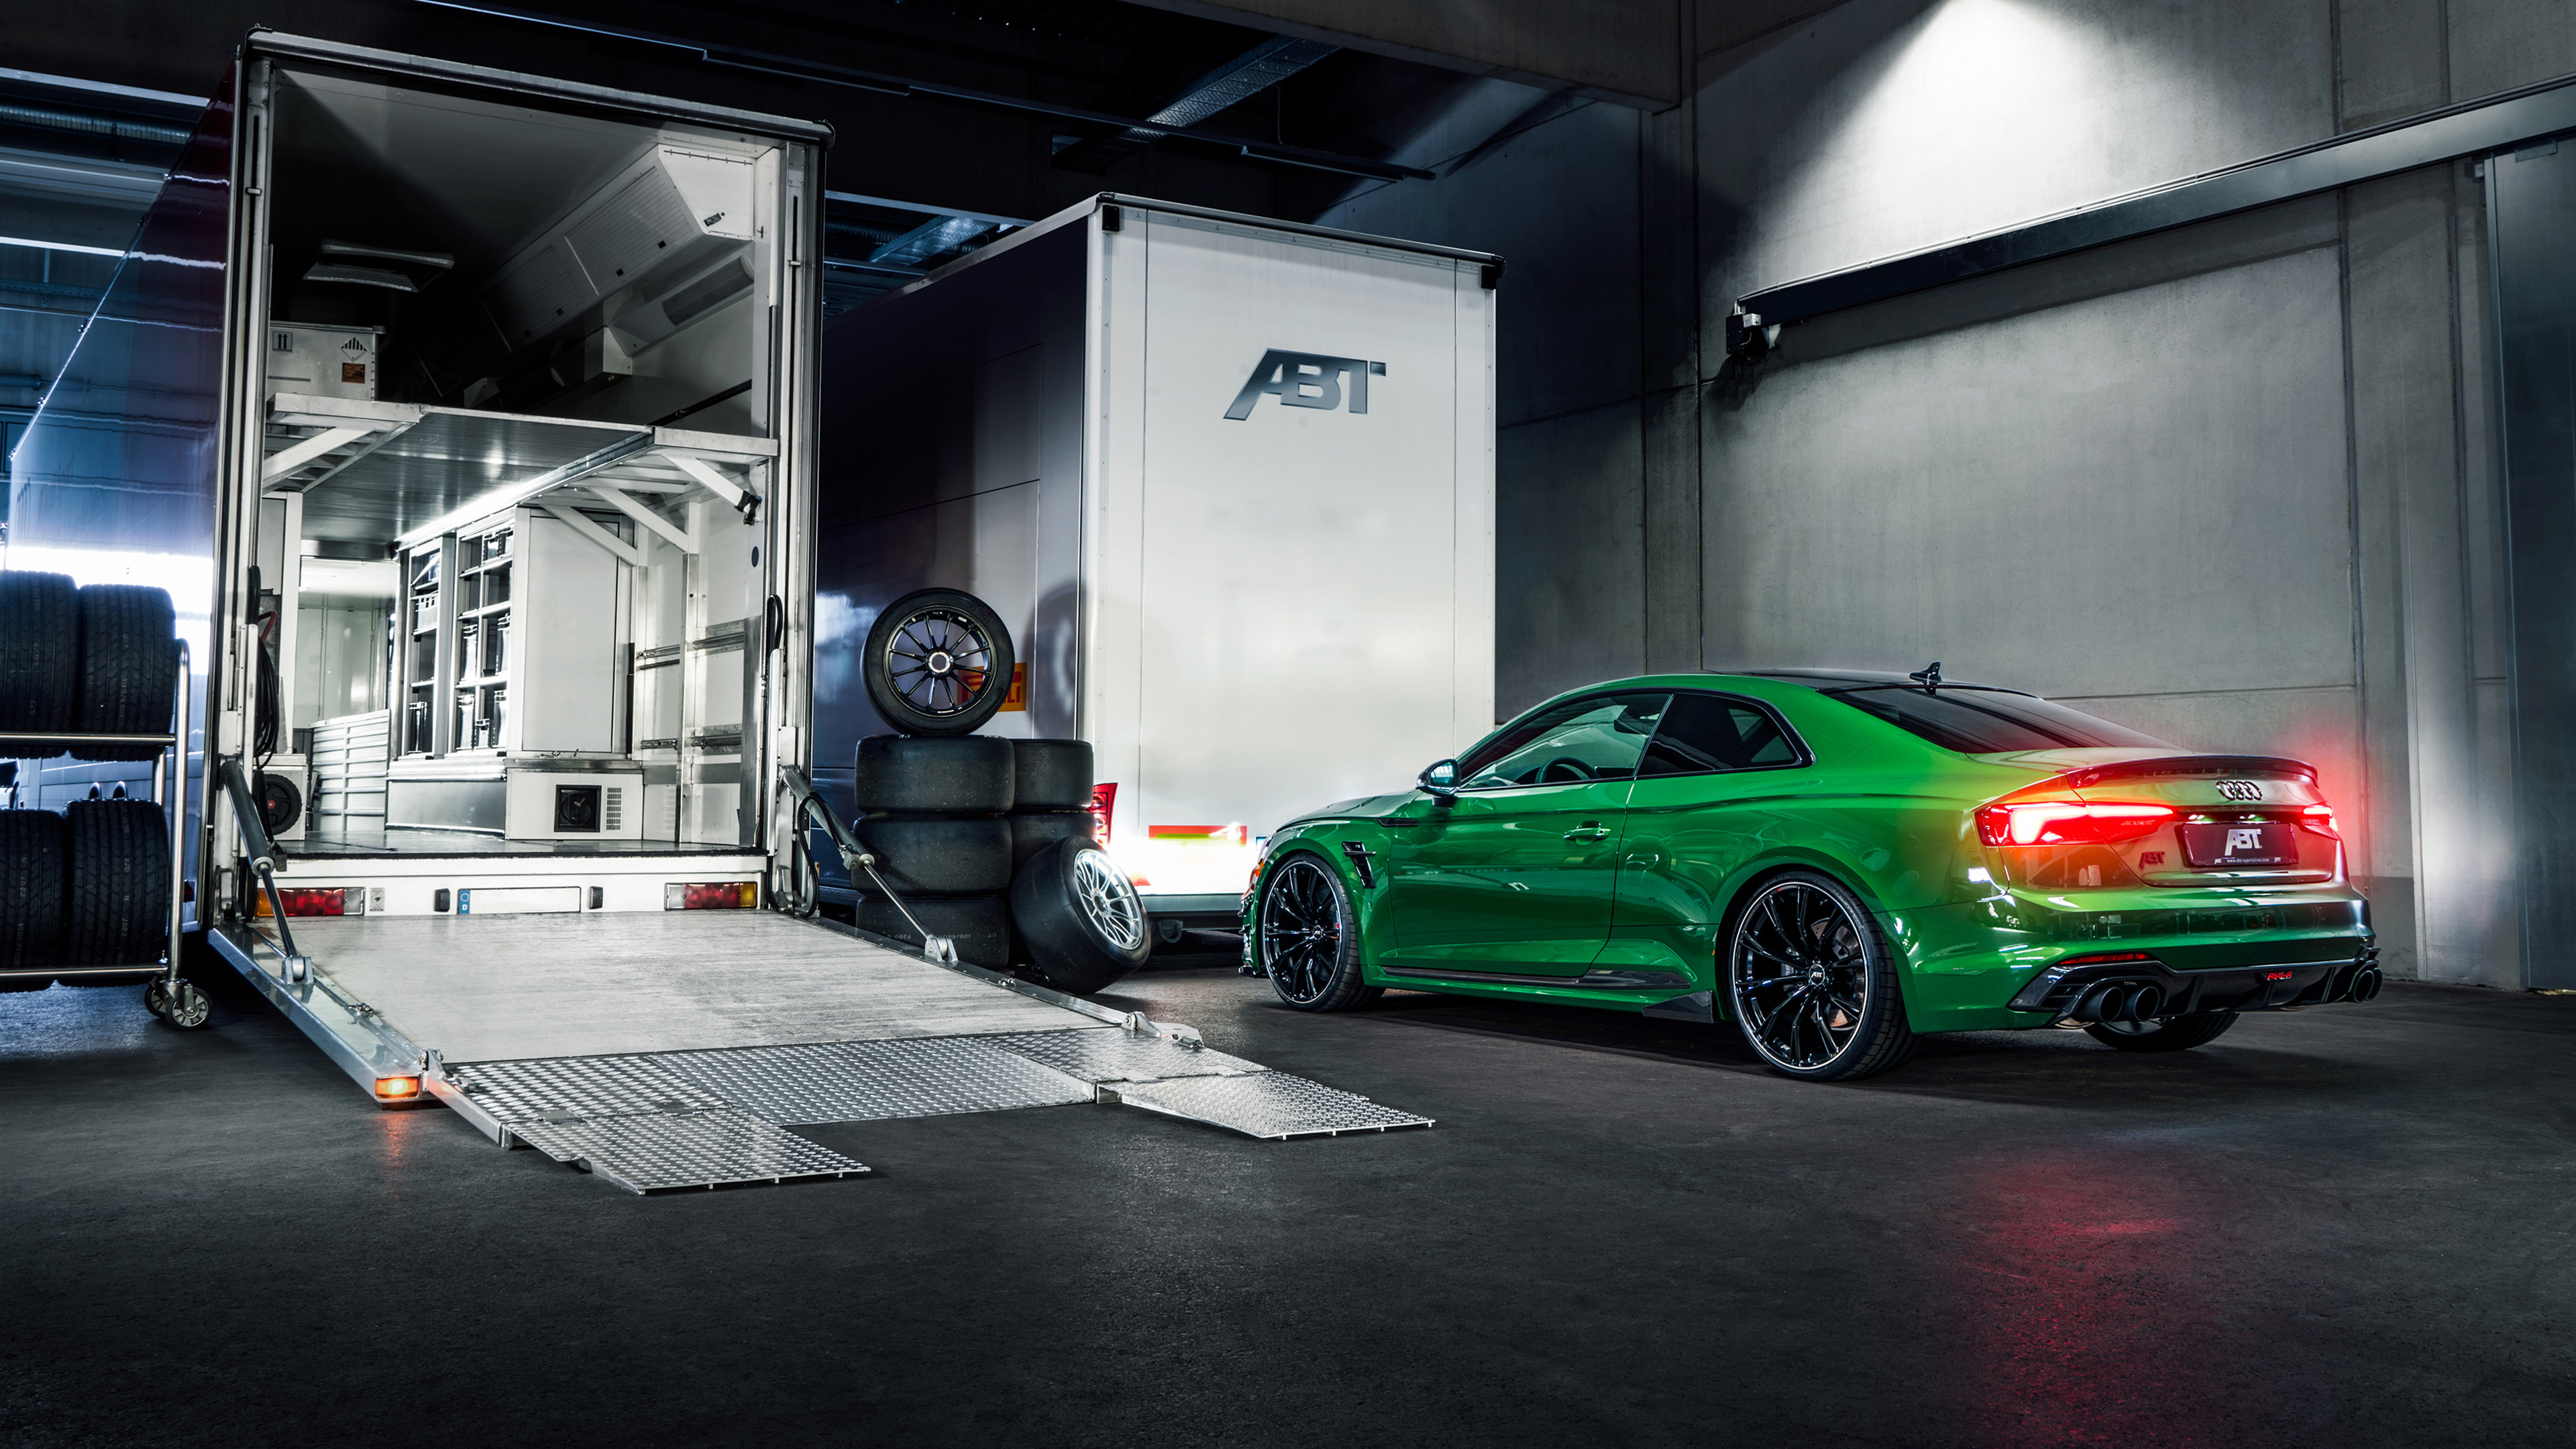 2018 ABT Audi RS 5 R Coupe 4K 2 Wallpaper HD Car